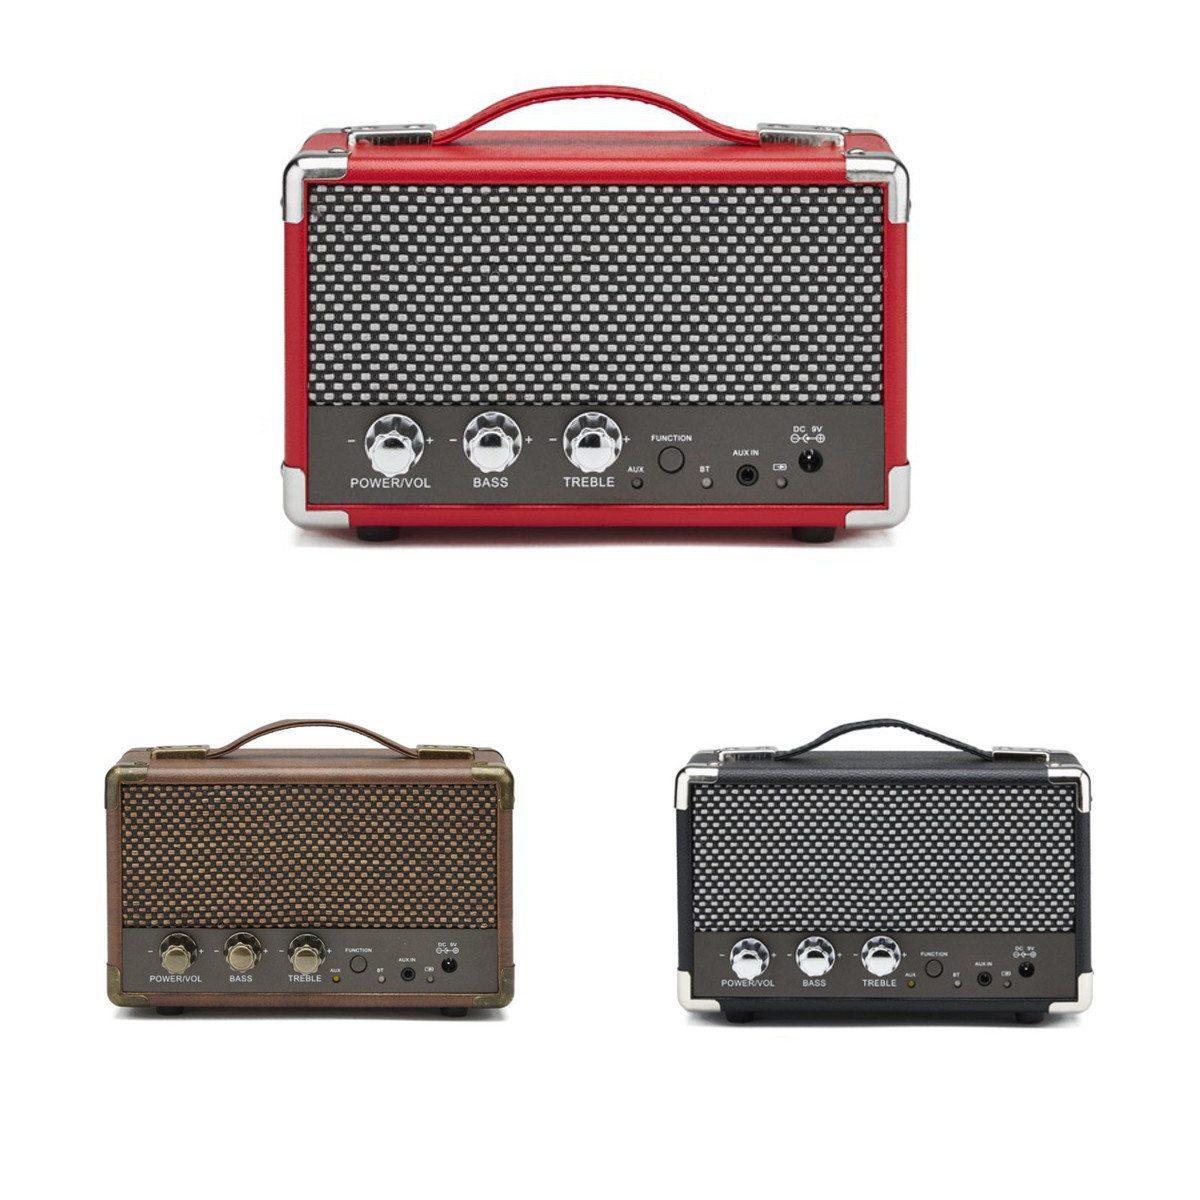 GPO Westwood Mini-Bluetooth-Lautsprecher